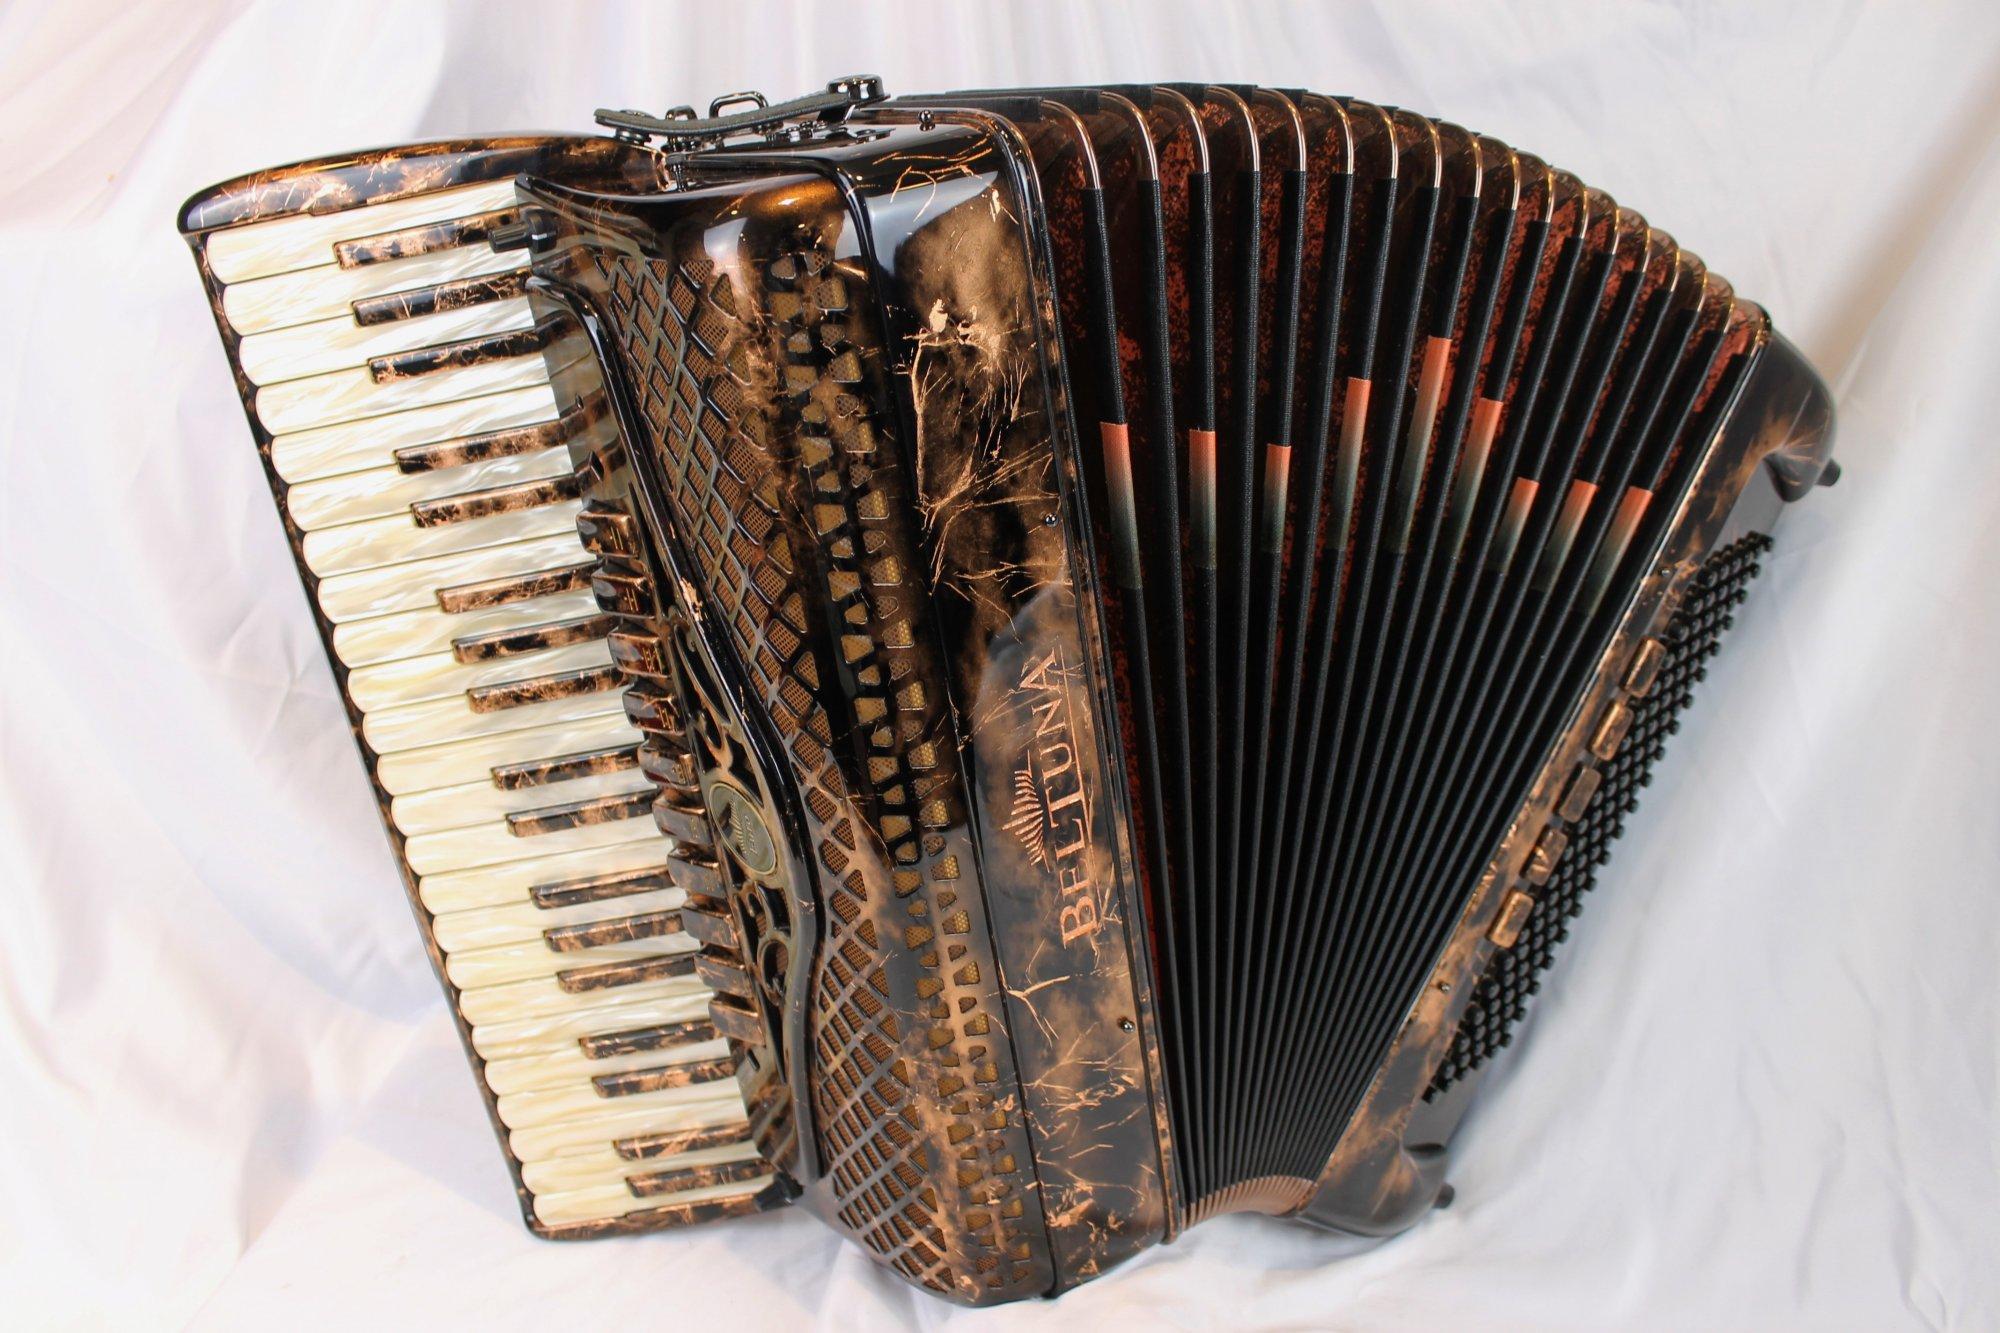 NEW Antique Copper Beltuna Euro IV Special Piano Accordion LMMM 41 120